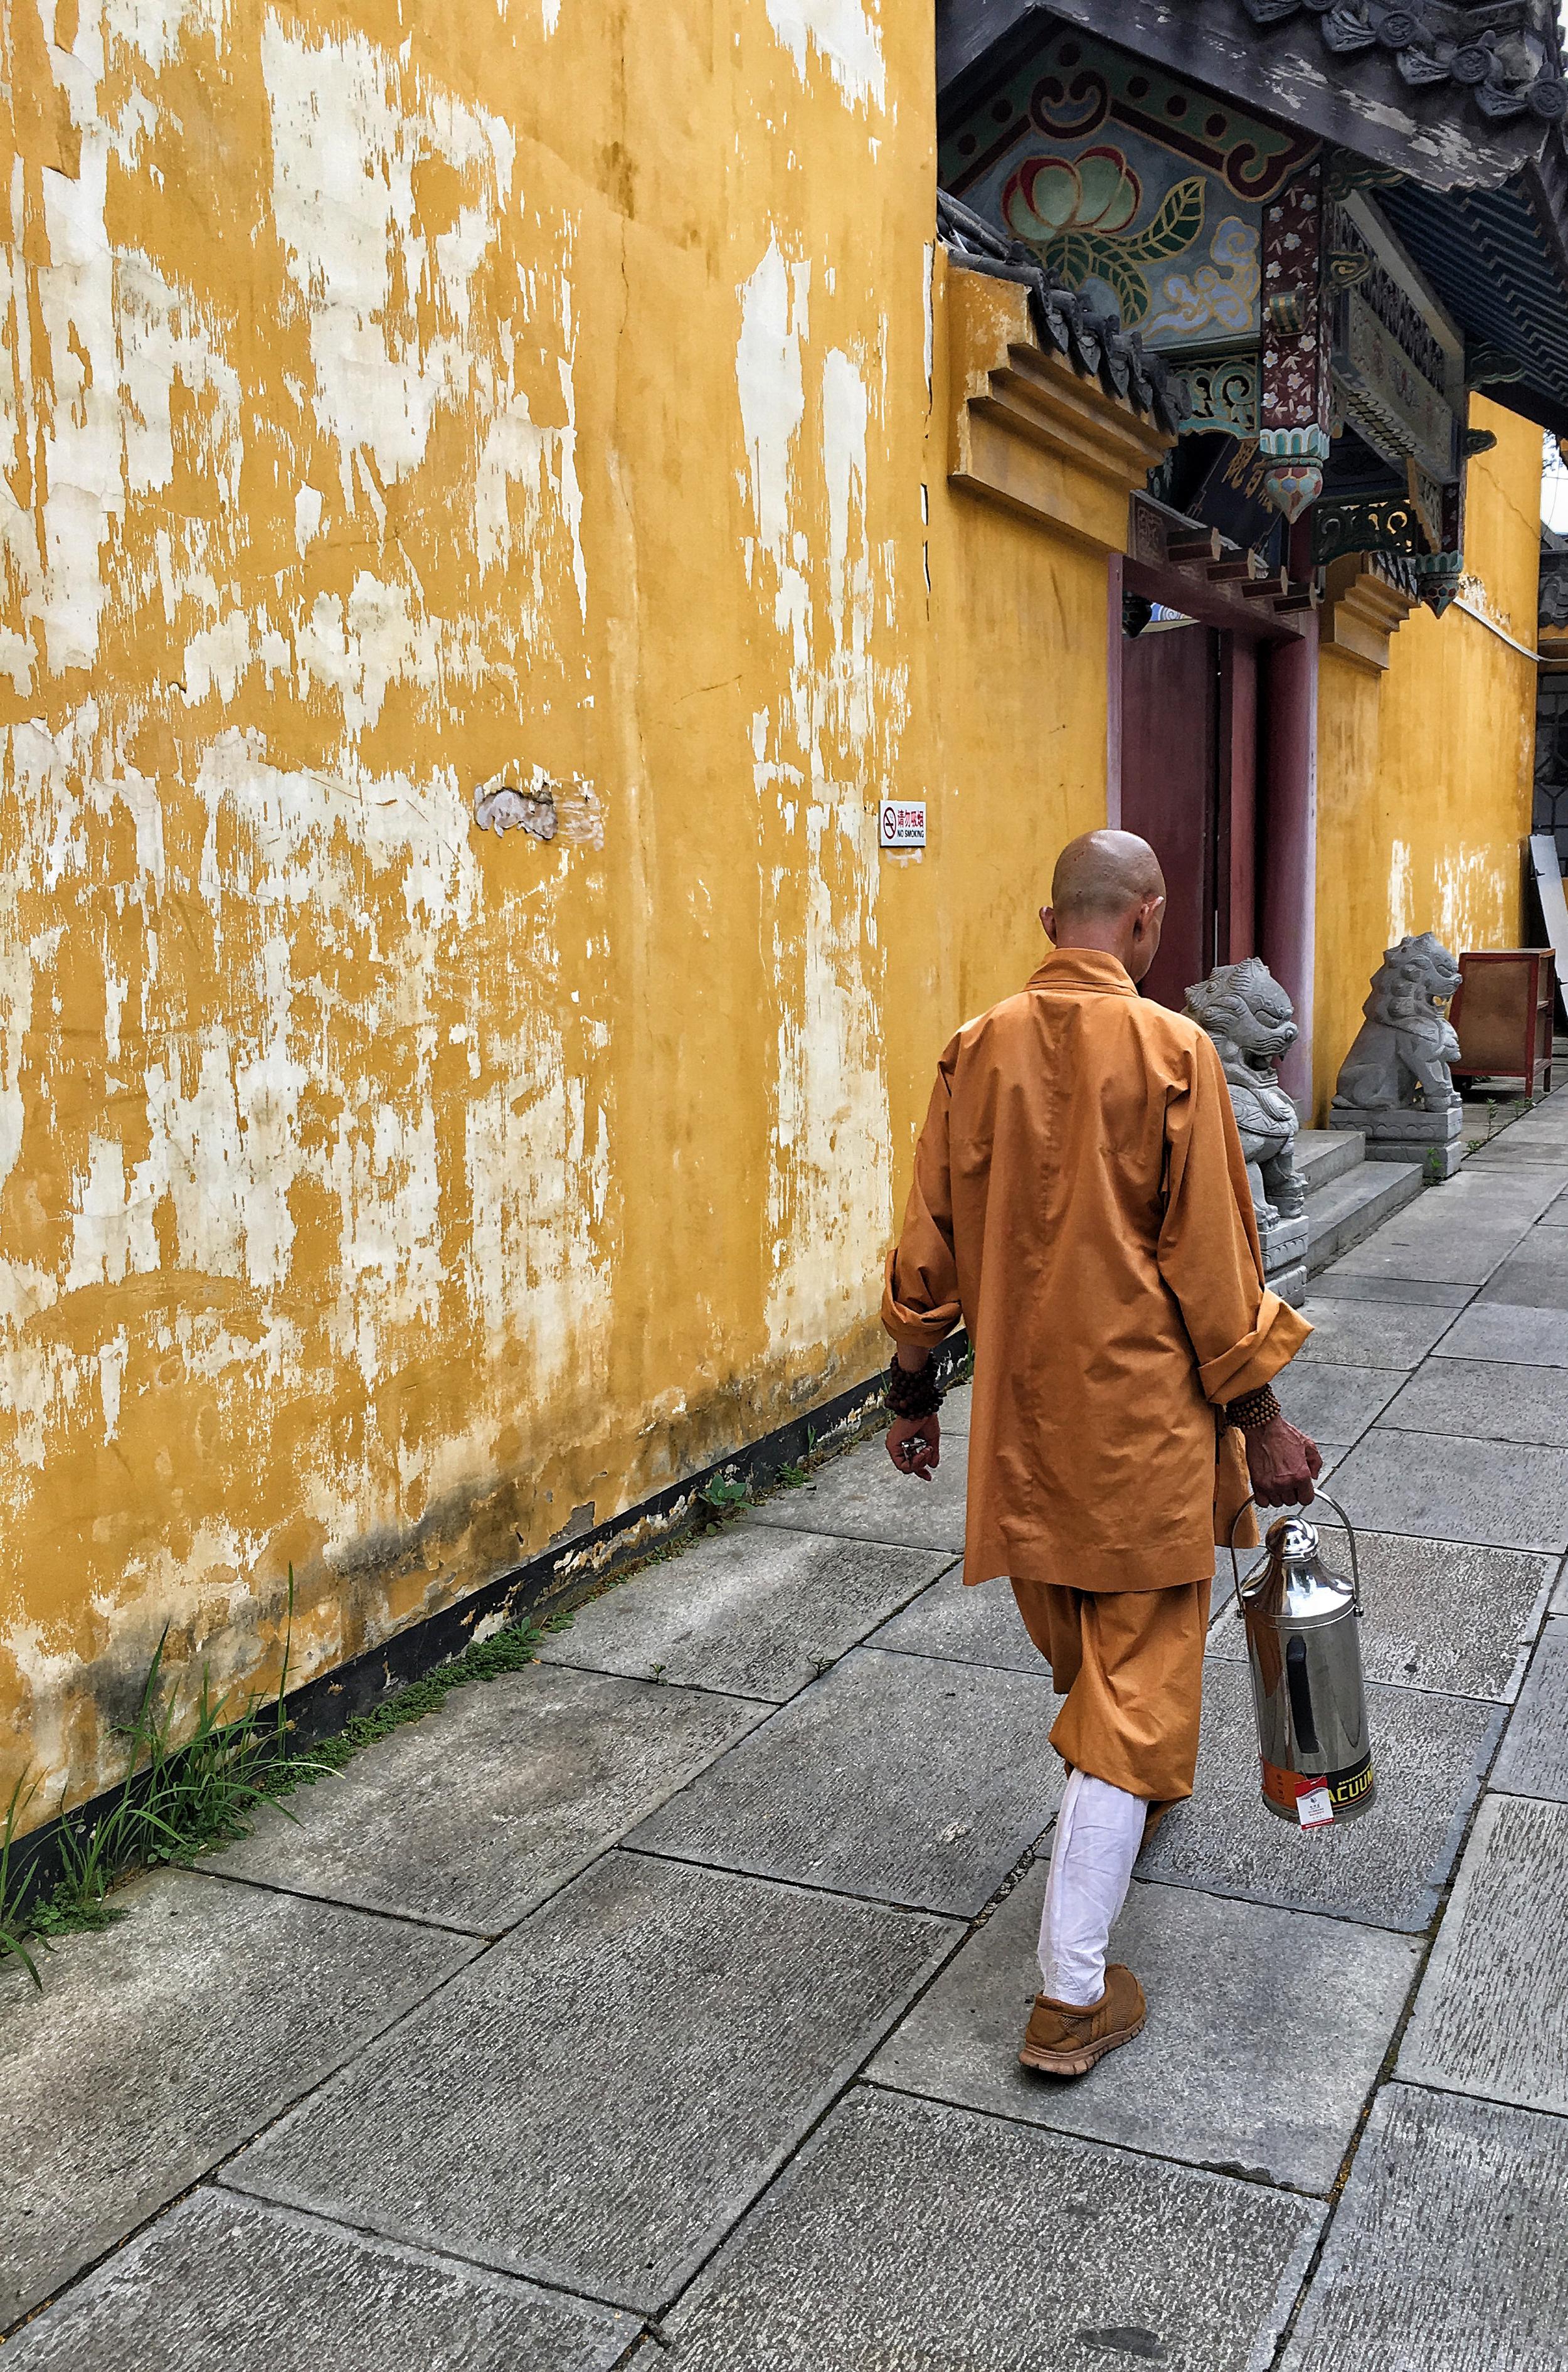 Boatang Temple, Wuhan